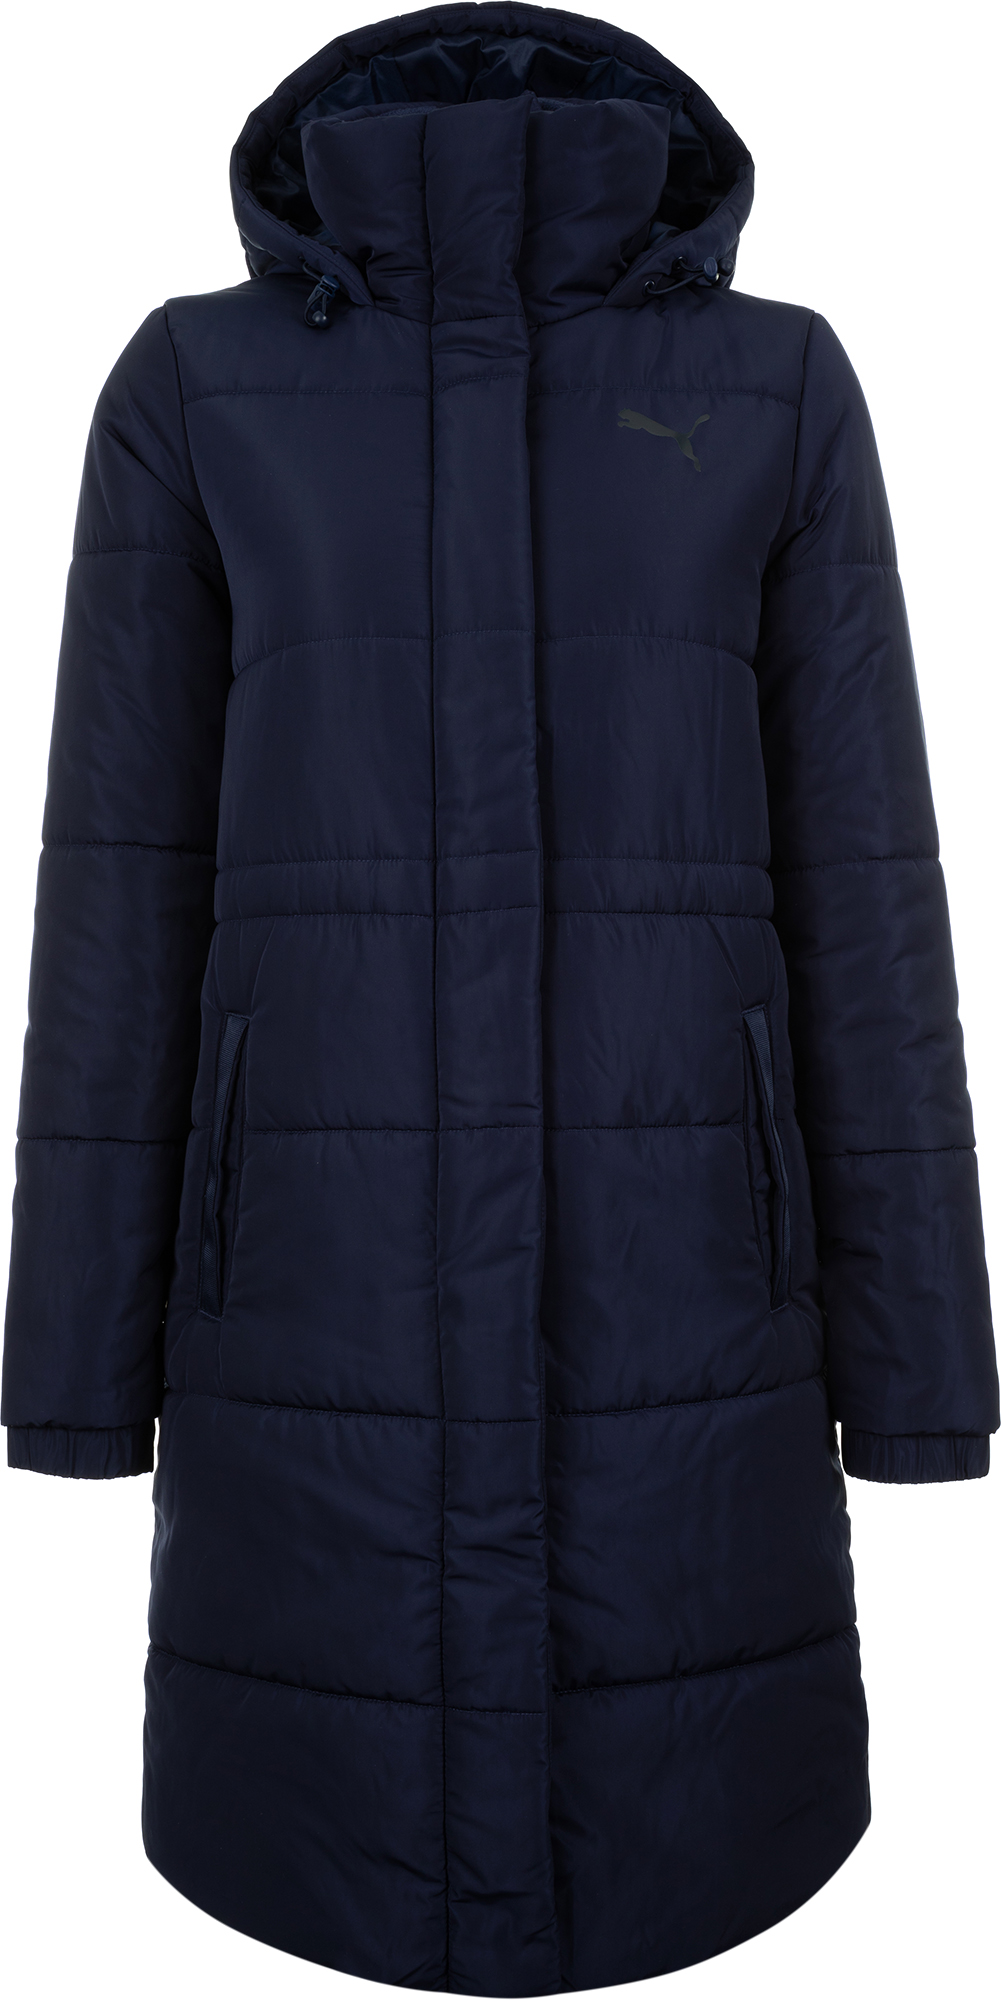 Puma Куртка утепленная женская Puma Ess Padded Coat, размер 46-48 puma style padded jacket w forest night